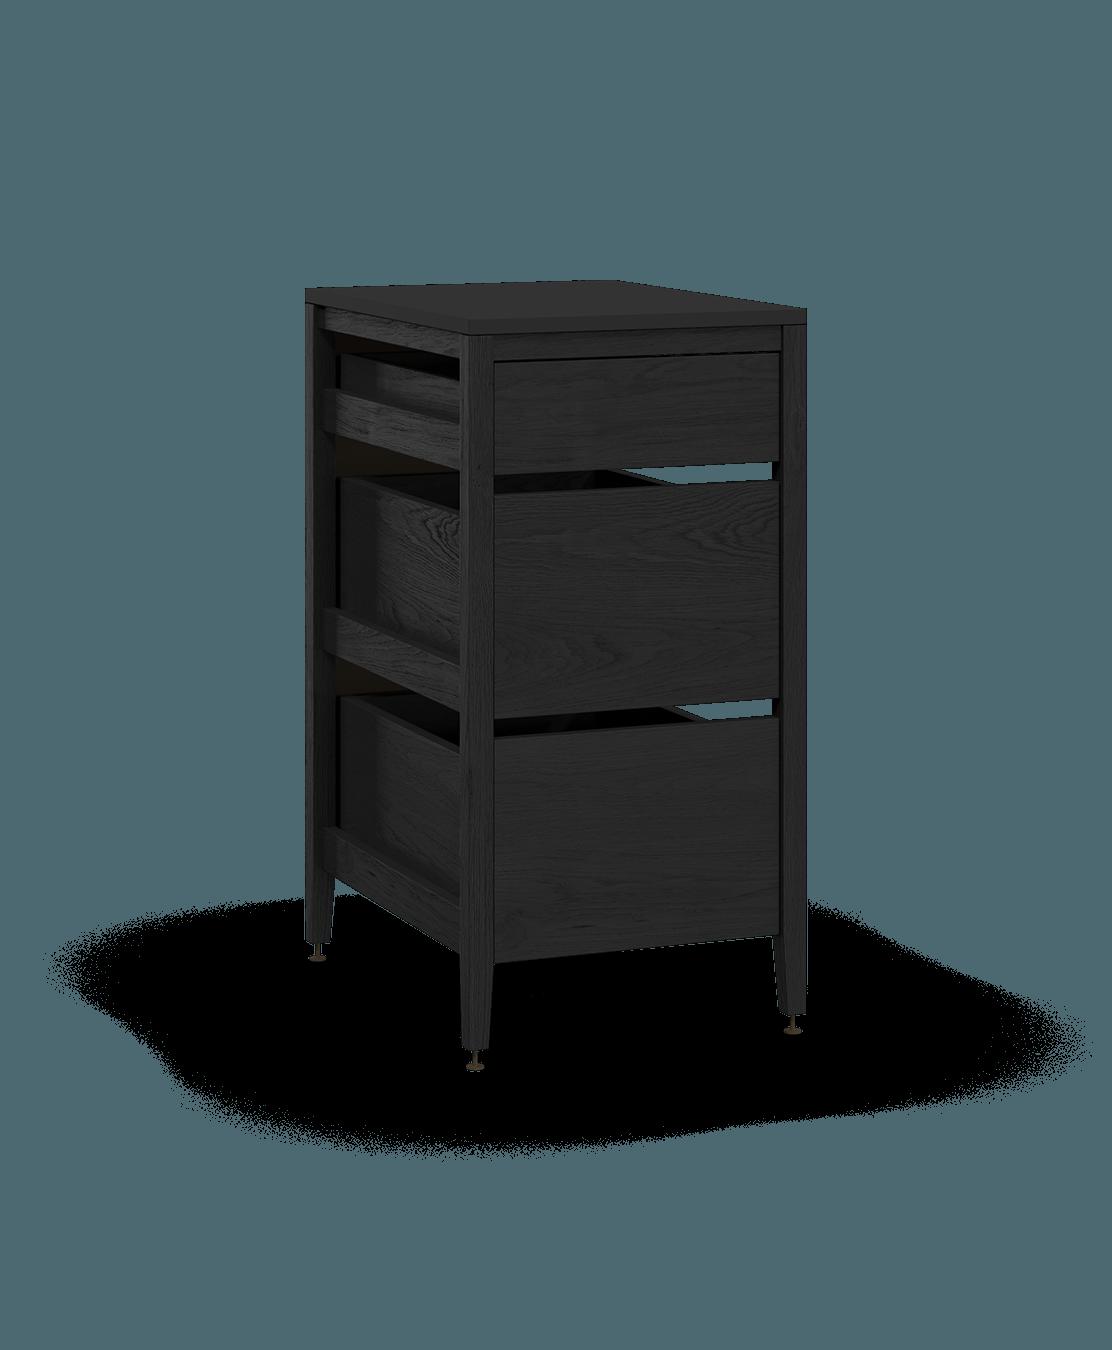 Radix Base Kitchen Cabinet 3 Drawers 21 In Black Stain Oak ...